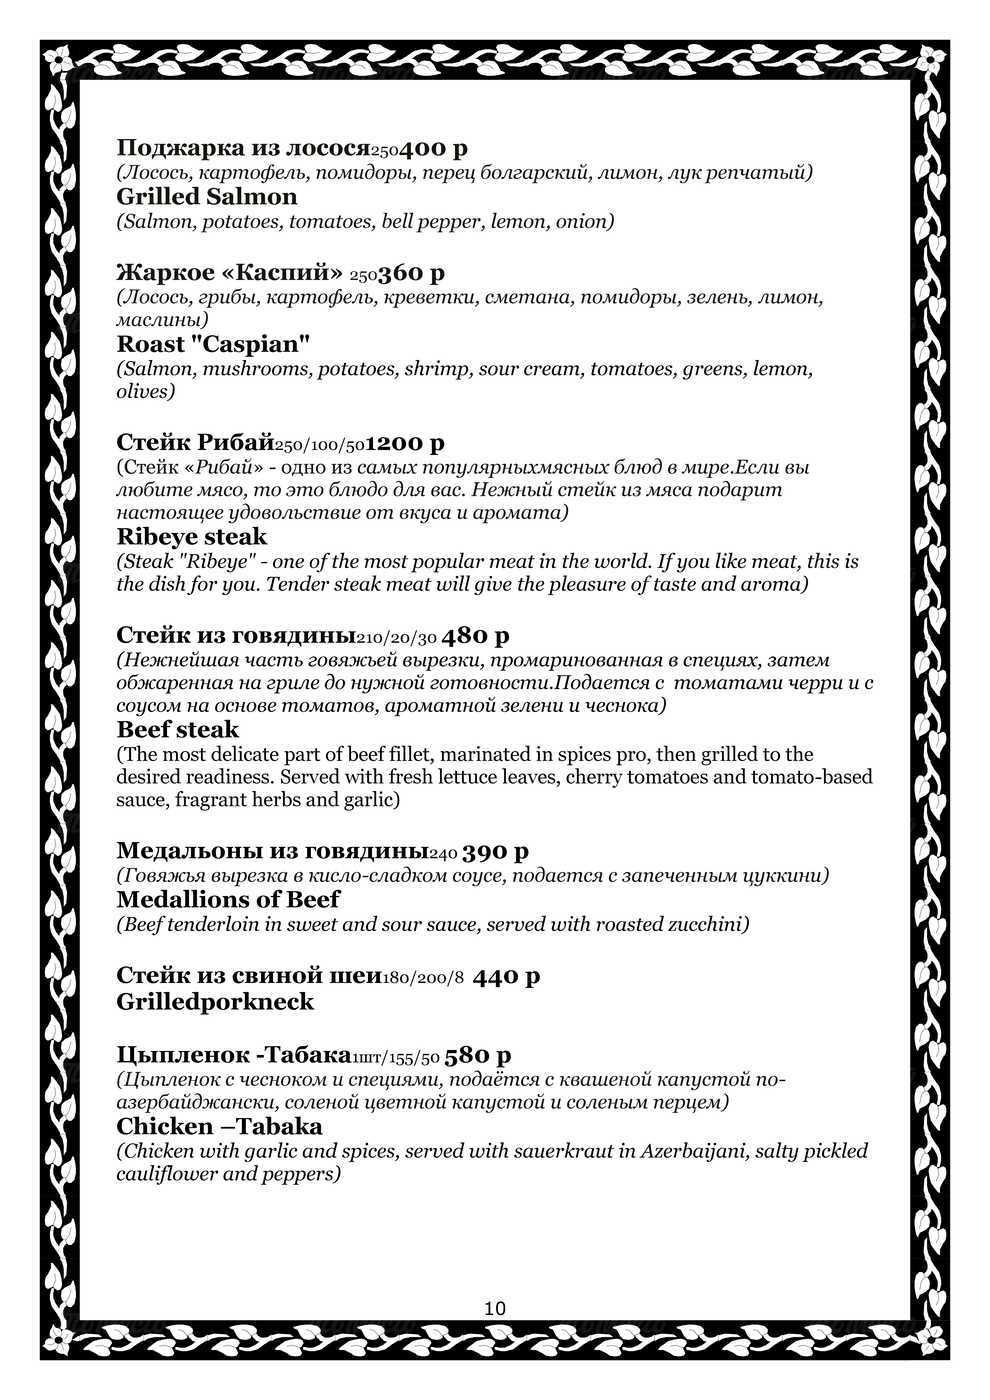 Меню ресторана Мархаба (Marhaba) на набережной реки Фонтанки